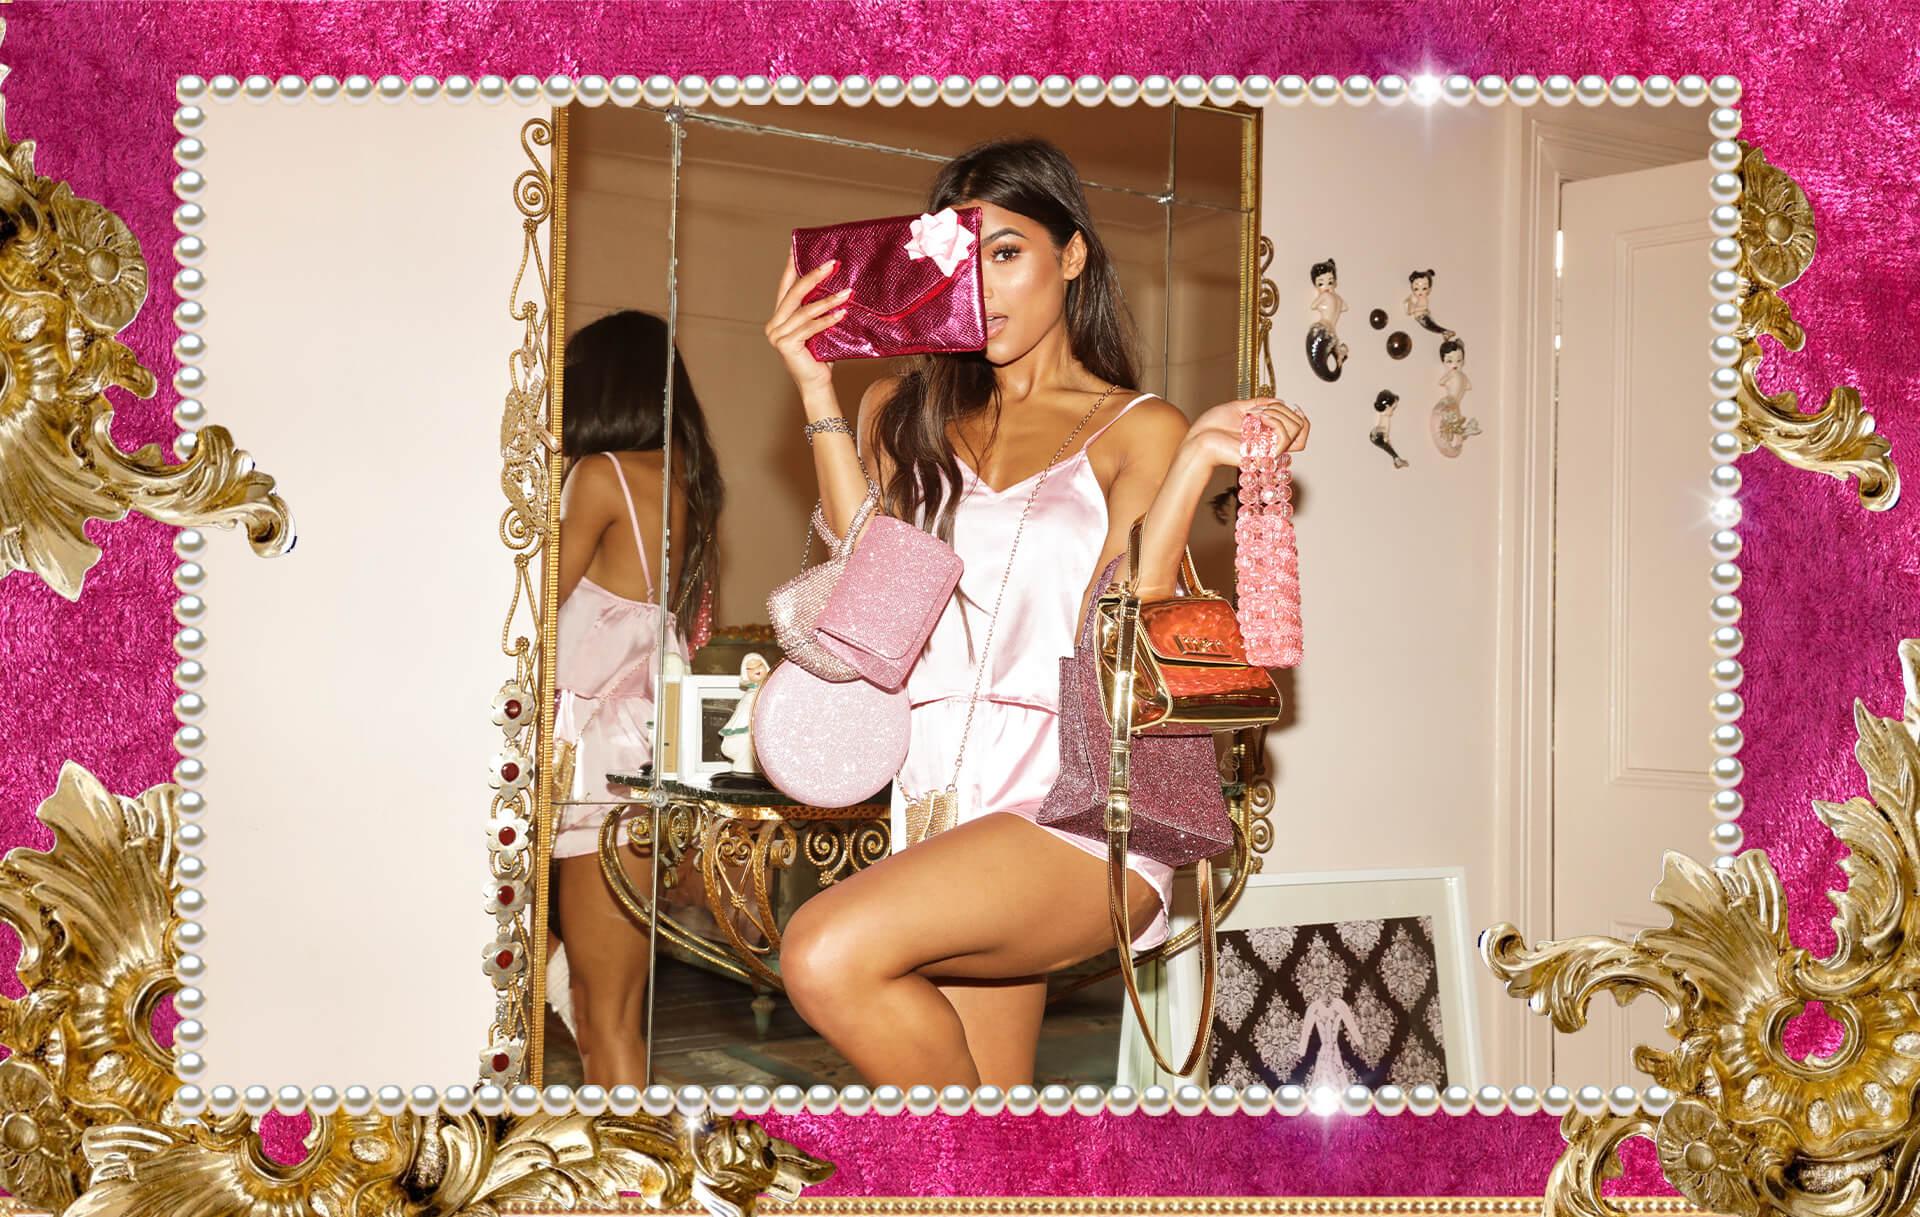 Christmas Lookbook Pink Satin Pyjamas Desktop